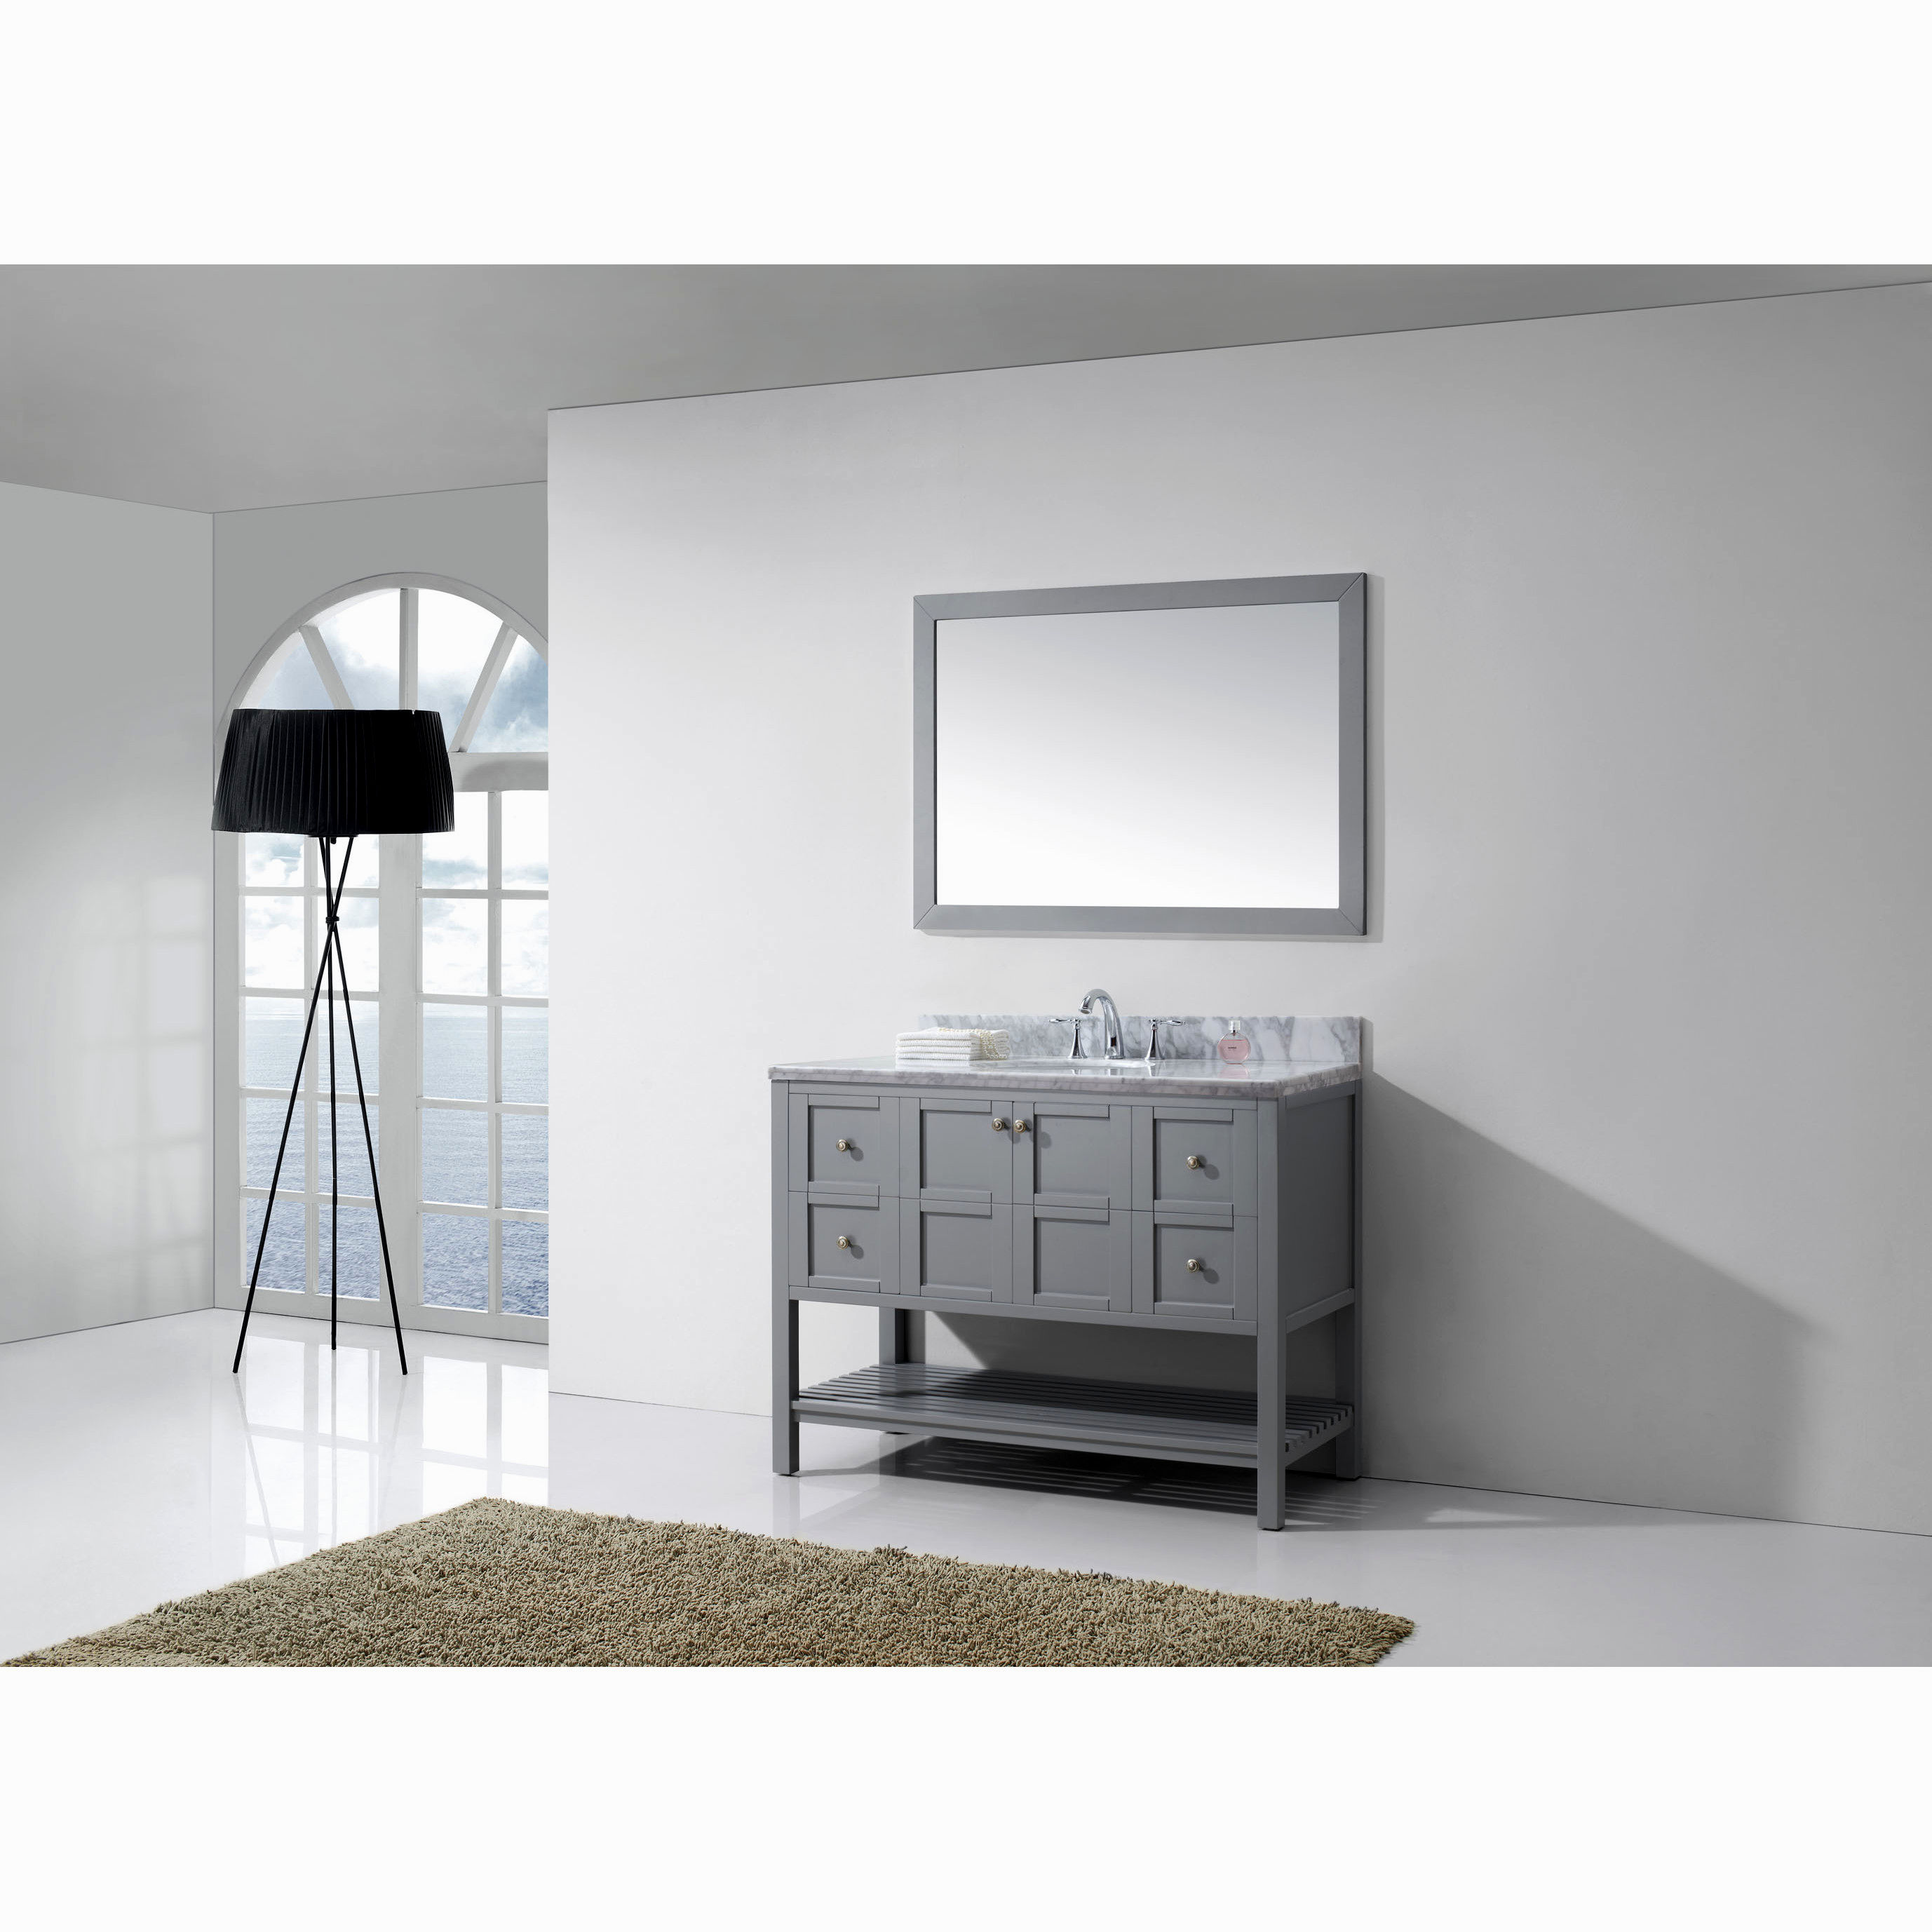 kitchen bathroom pics trend u by wayfair depth for style barn unbelievable image narrow and mckenna trends decoration bertch vanities cabinet pottery vanity